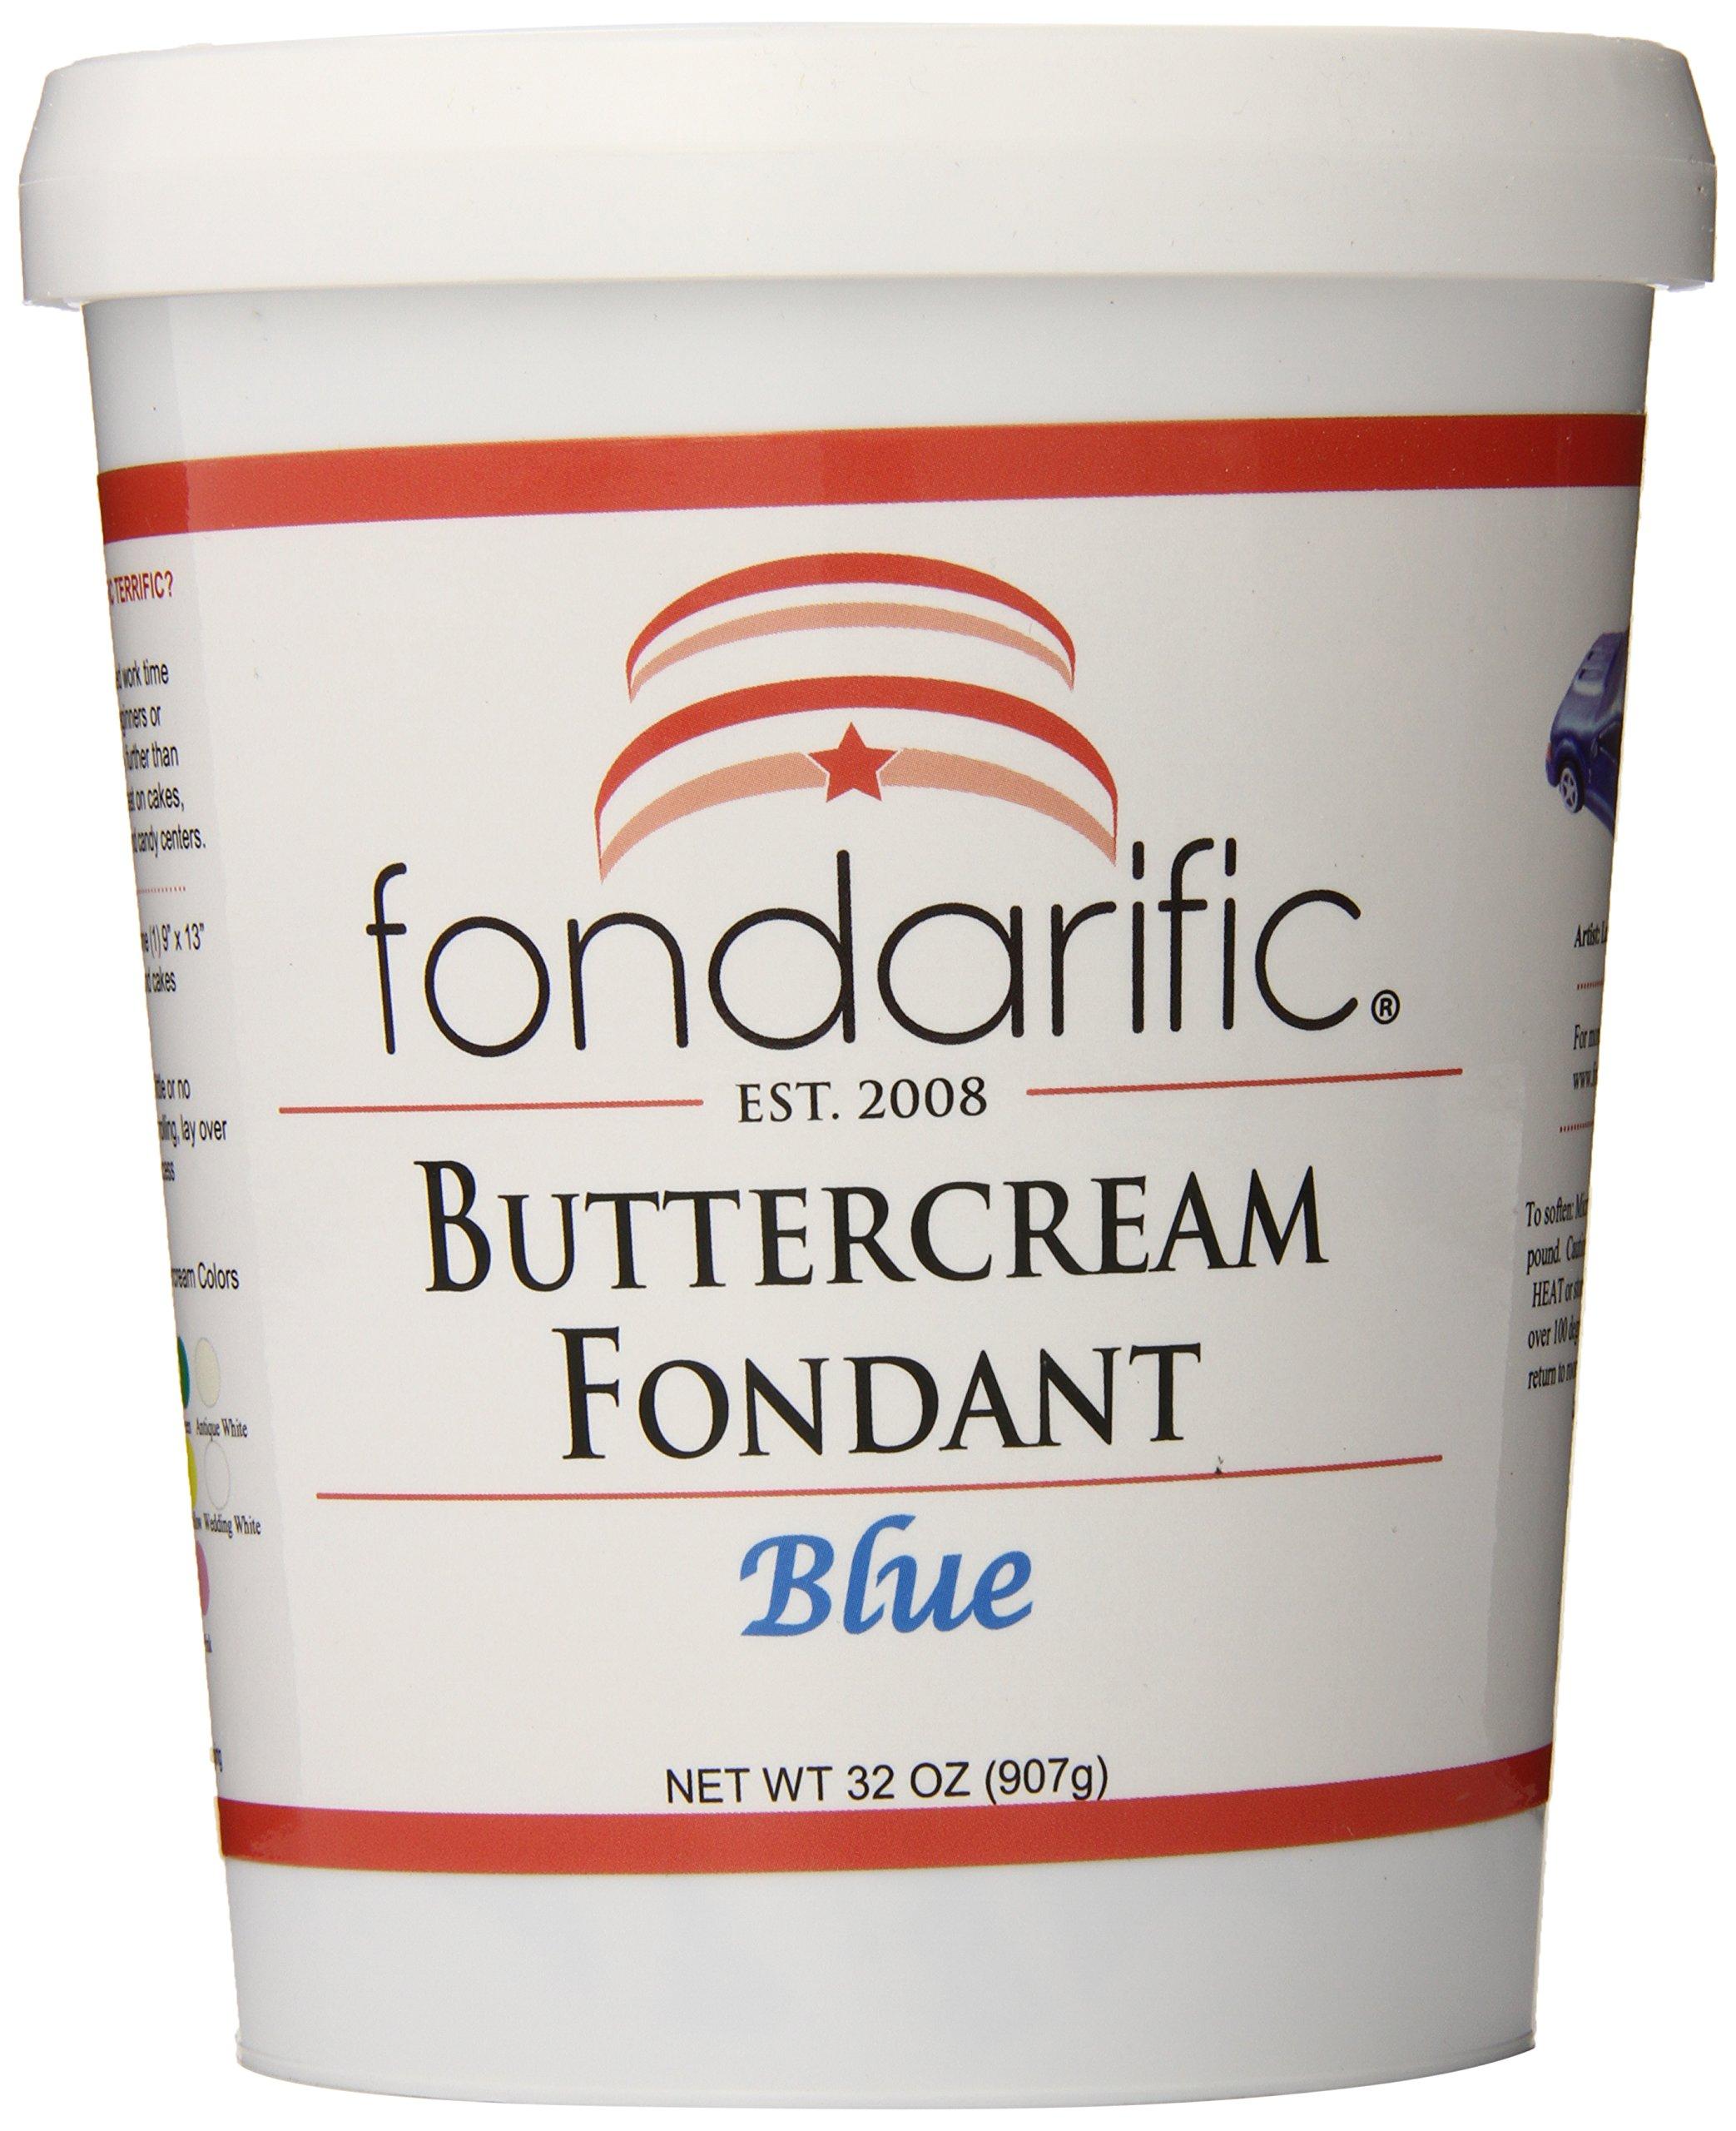 Fondarific Buttercream Blue Fondant, 2-Pounds